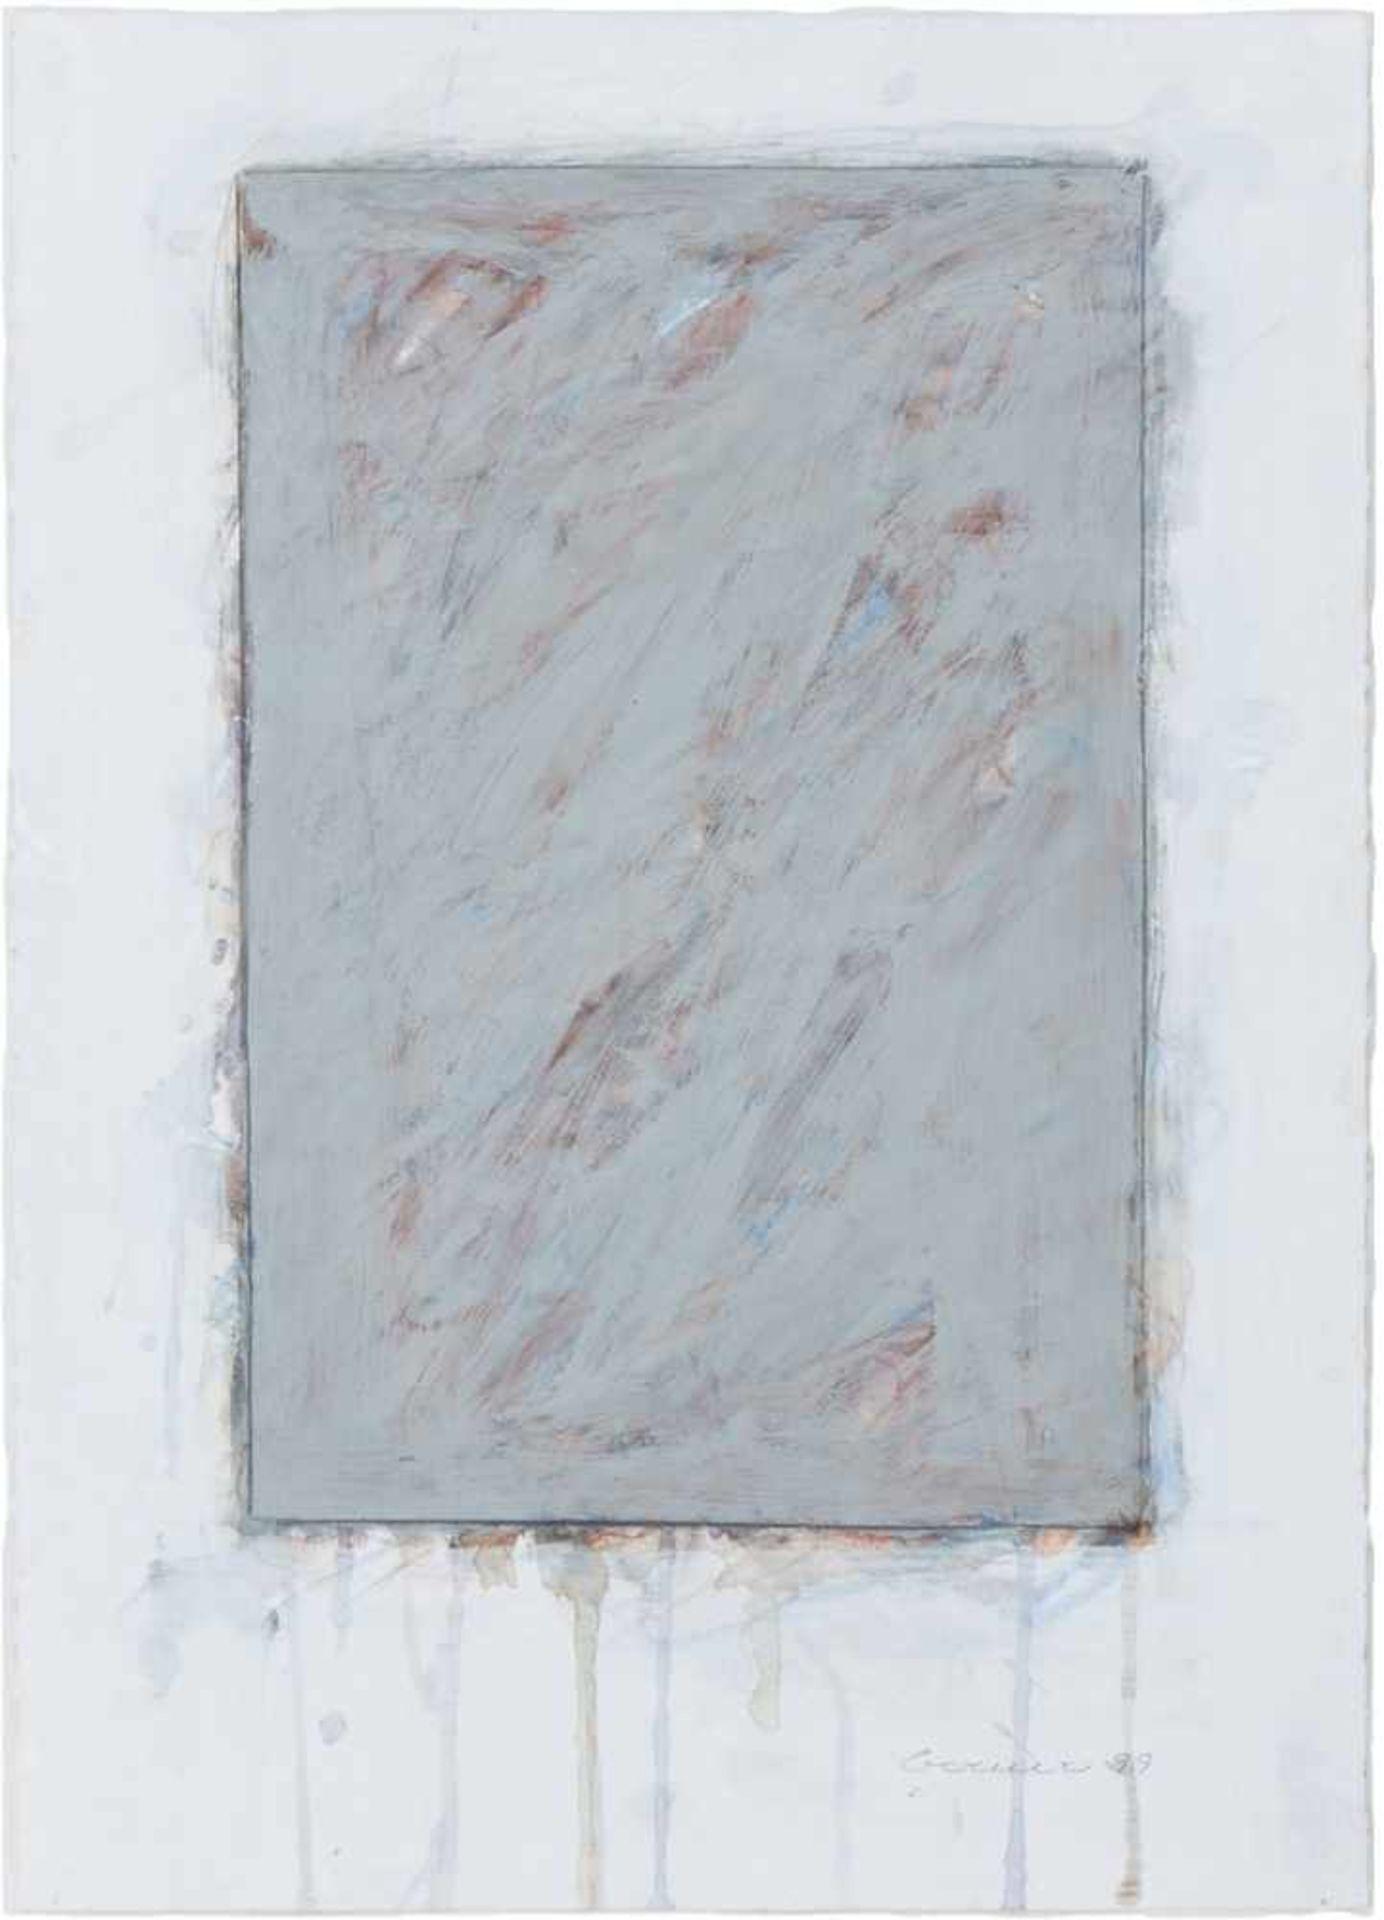 Los 23 - BERND BERNER(1930 BERGEDORF - 2002 STUTTGART)o. T. (Flächenraum), 1999Acryl, Aquarell, Pastell auf